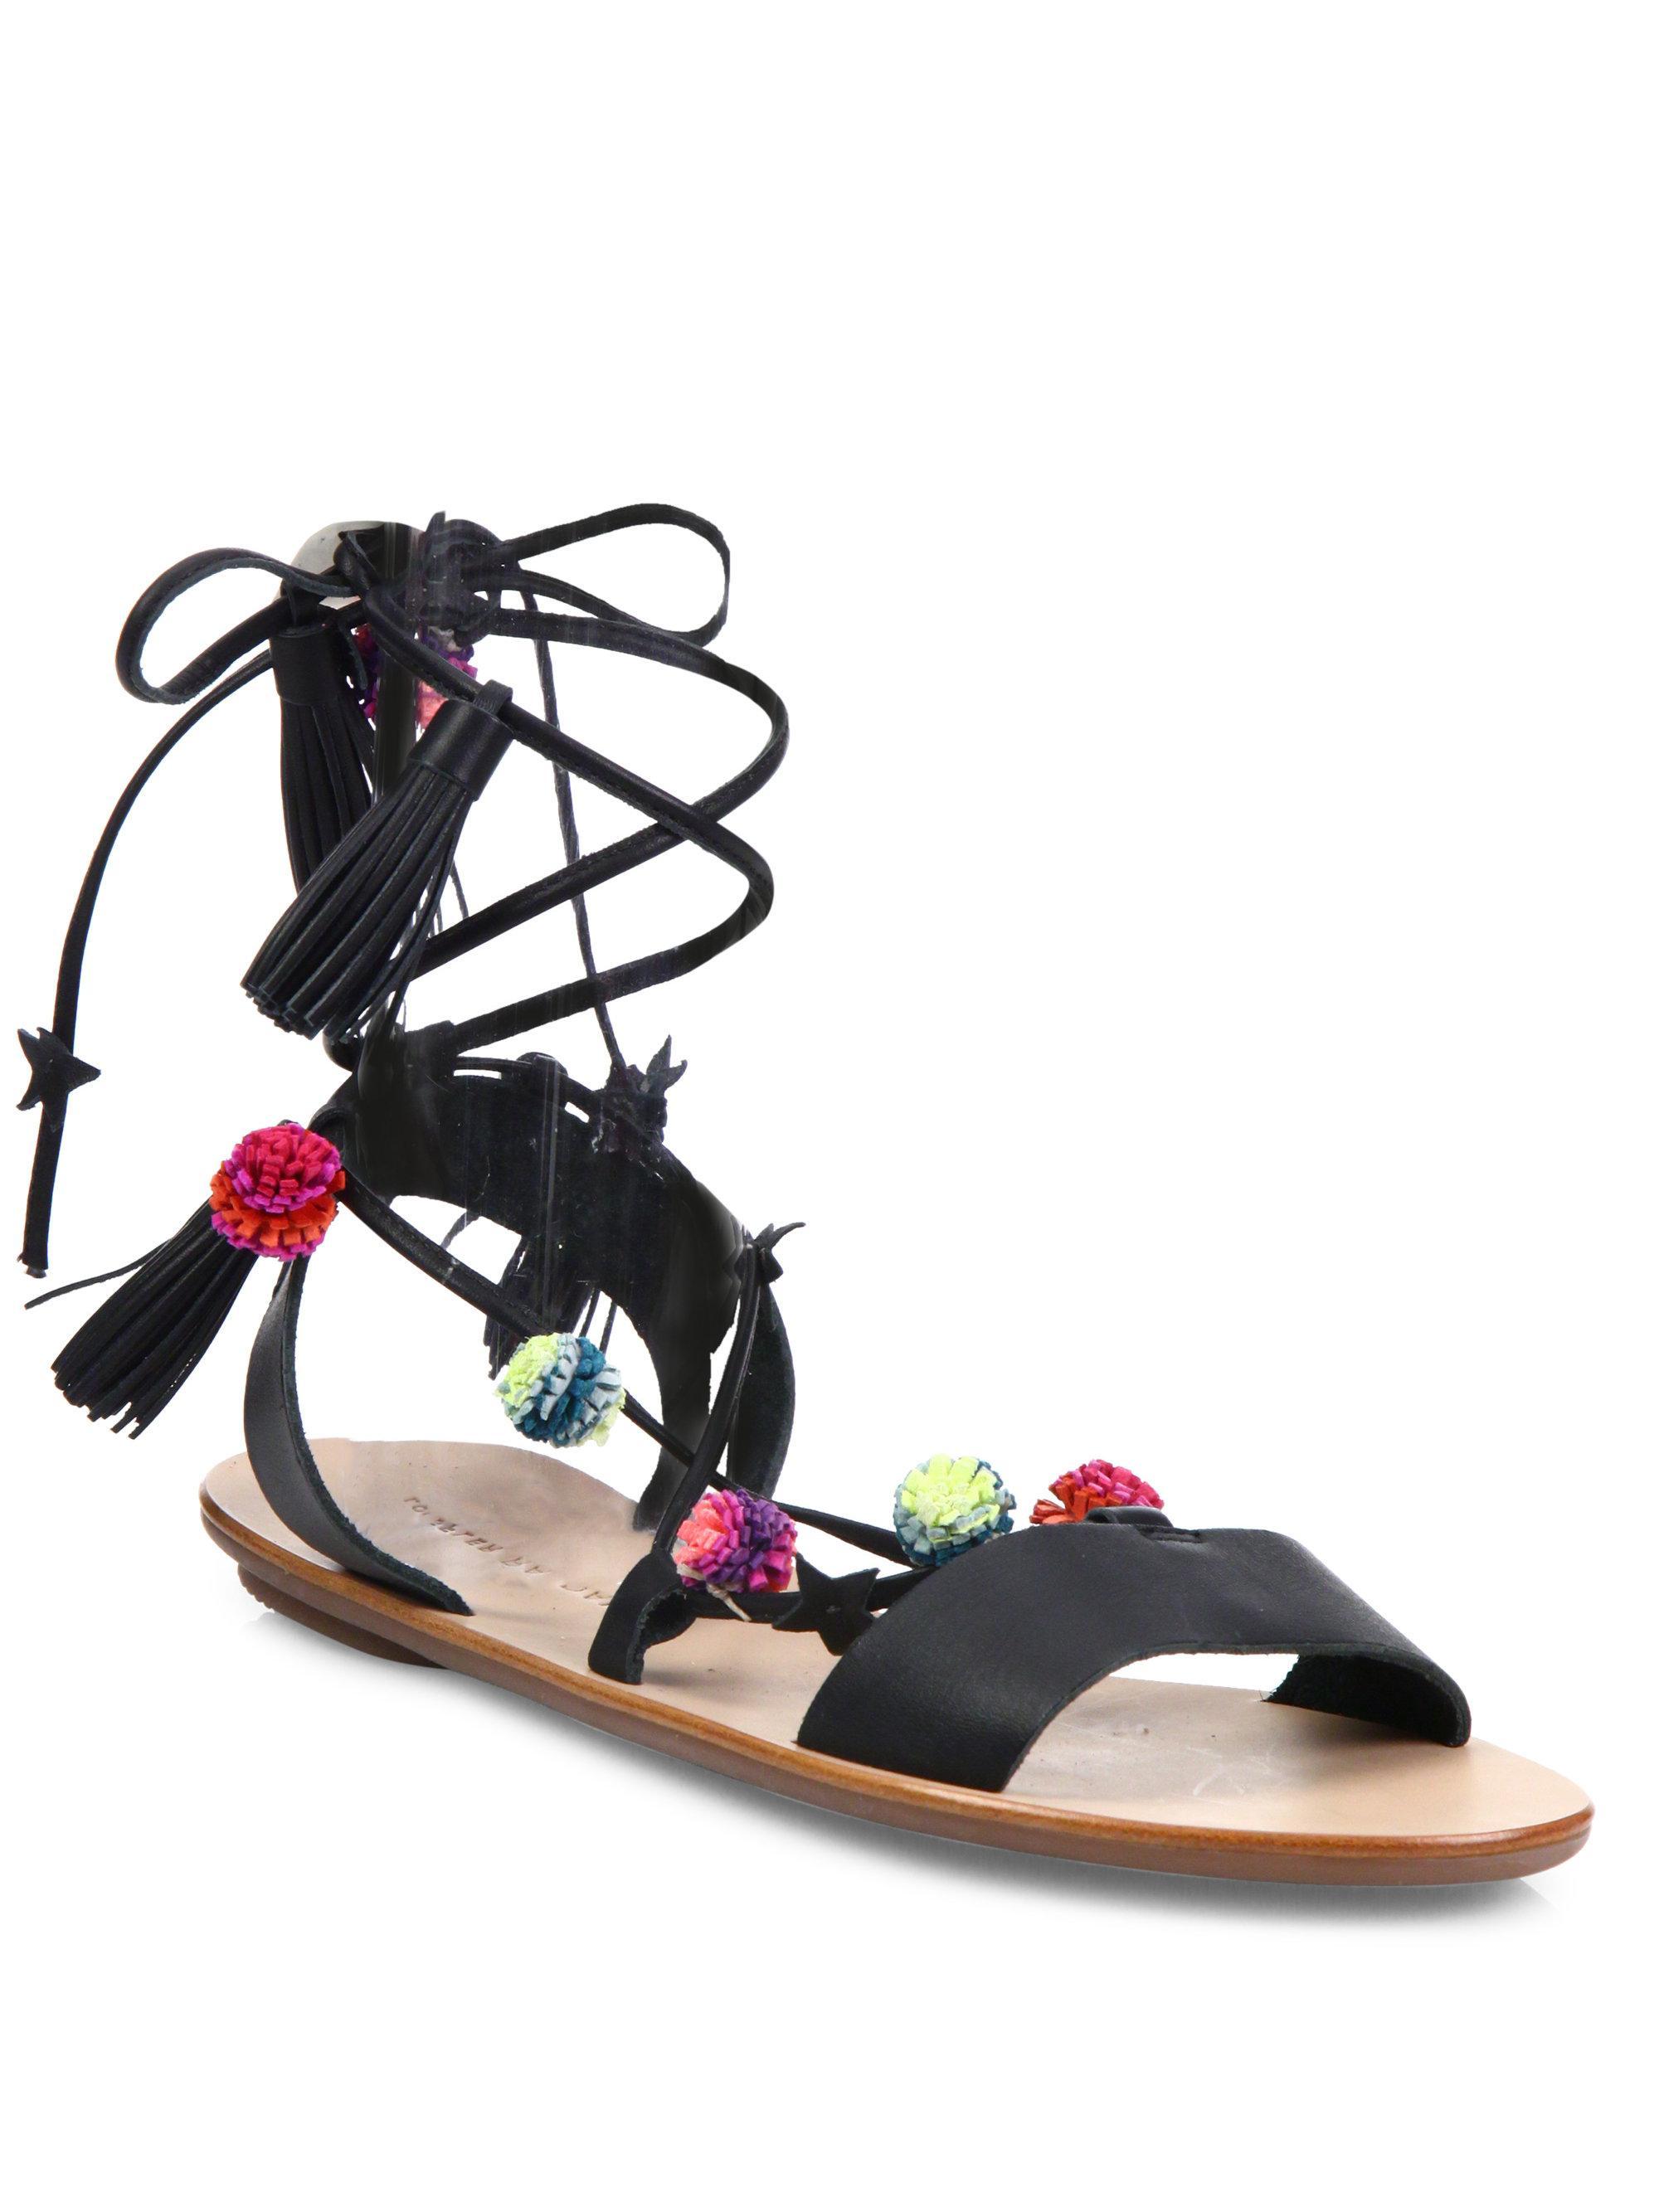 Loeffler Randall Suze Pom-Pom Leather Ankle-Wrap Sandals rg9TGHOtjg